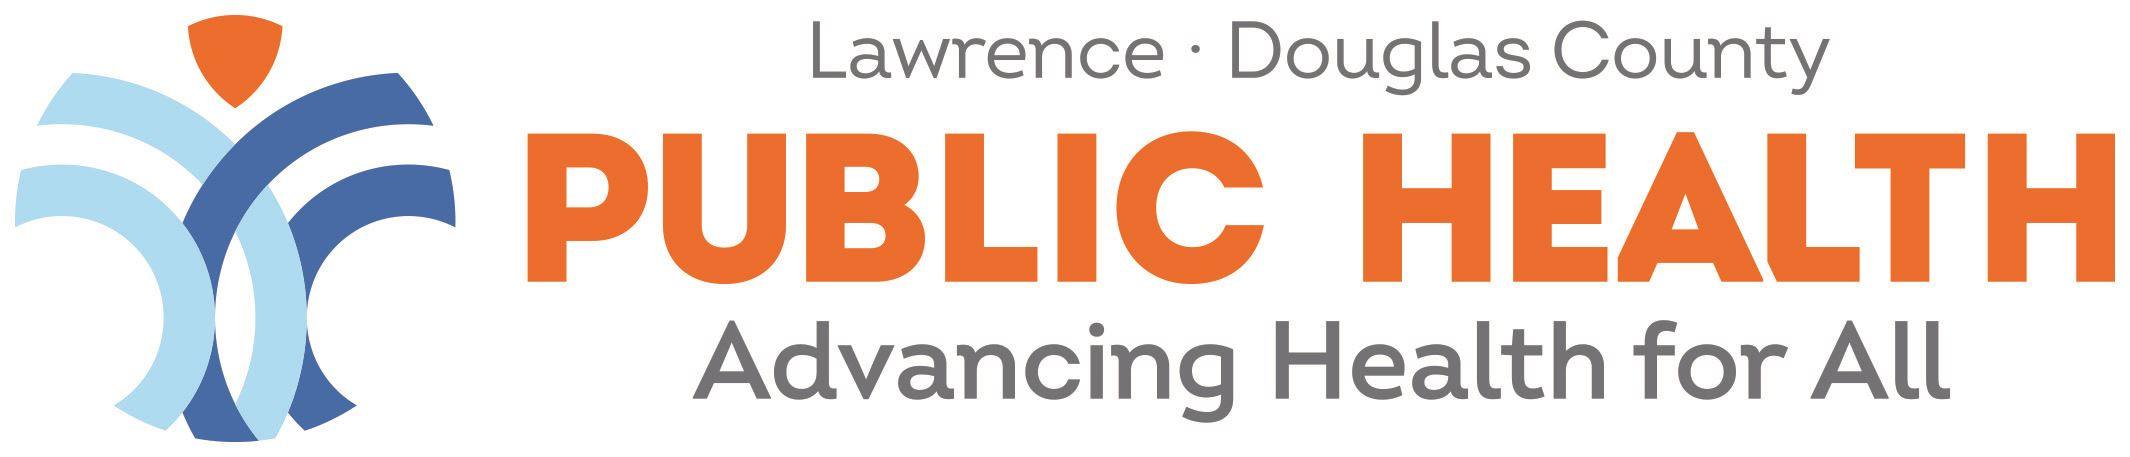 LDC Public Health, KS - Official Website